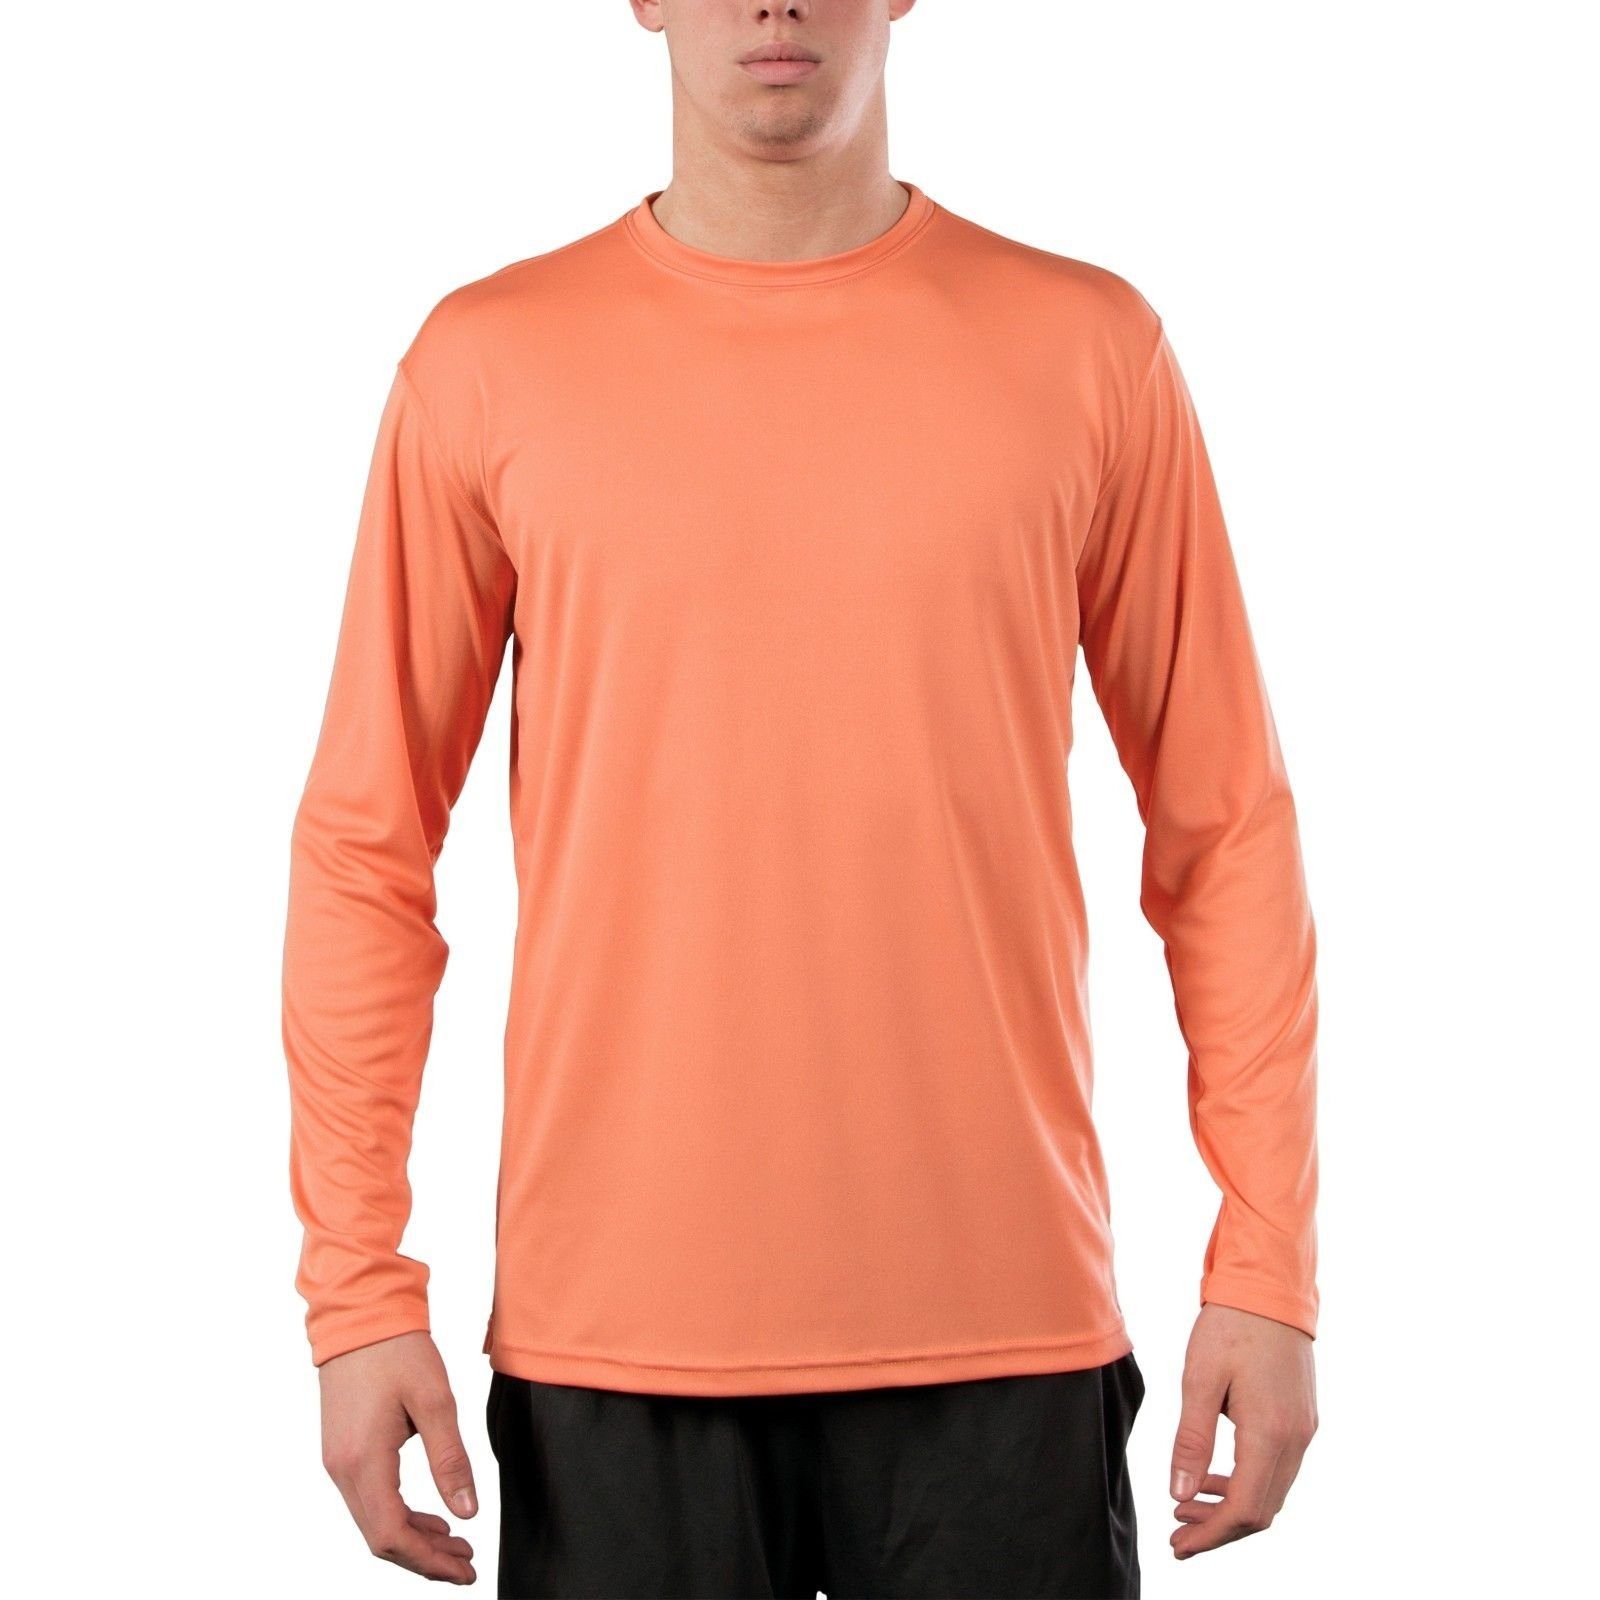 Vapor apparel men 39 s upf 50 uv sun protection long sleeve for Uv shirts long sleeve